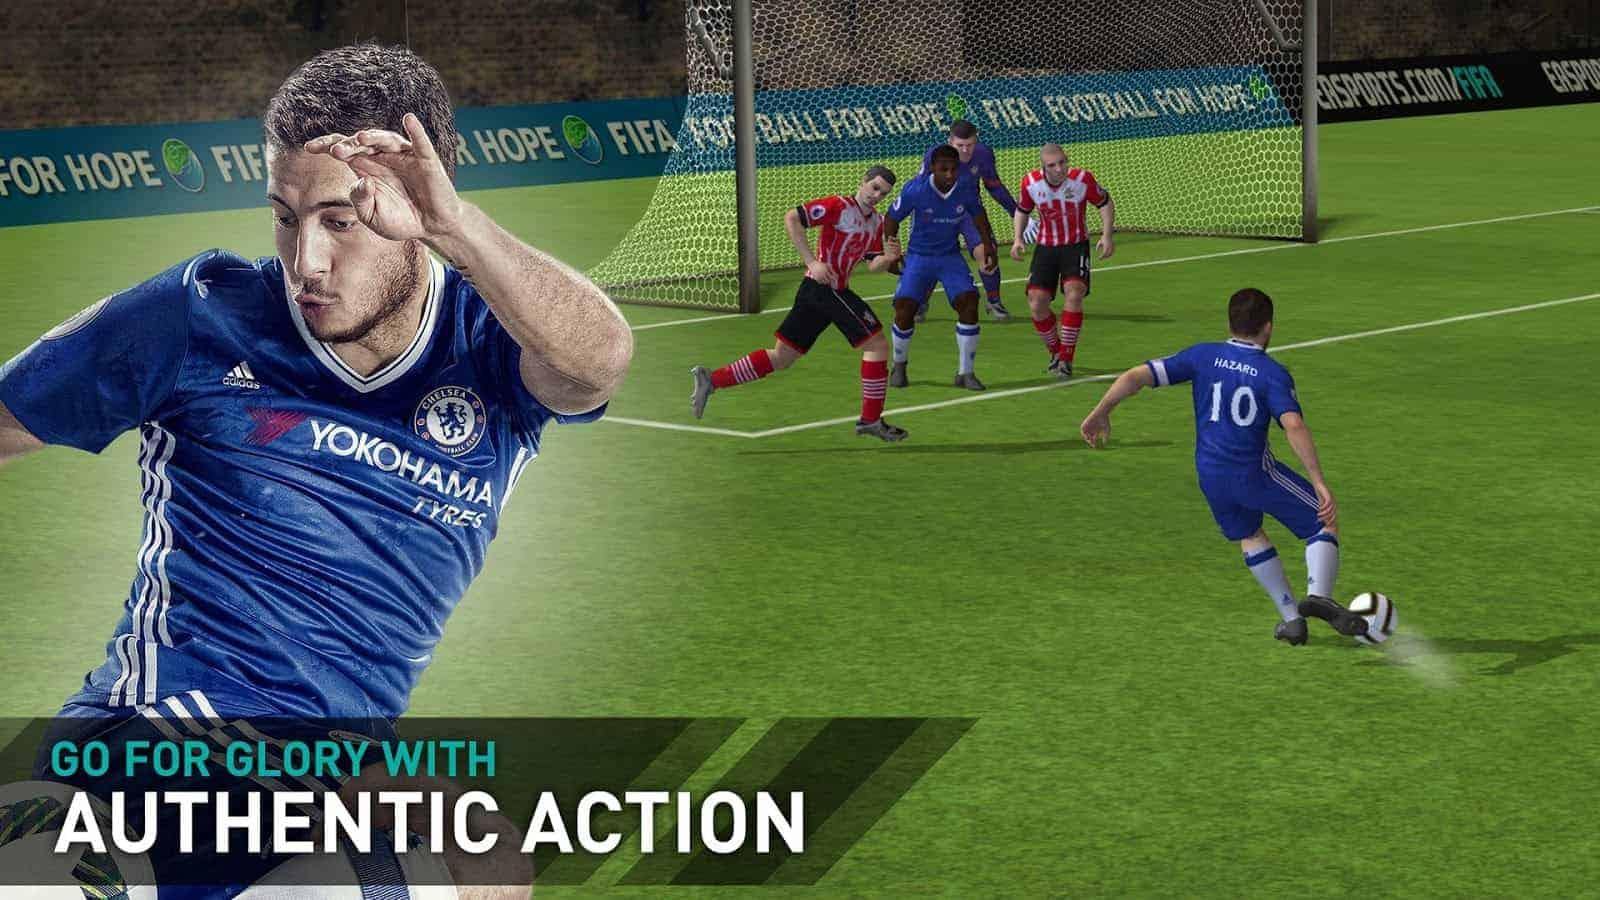 FIFA Mobile Soccer 2.0.0 APK games